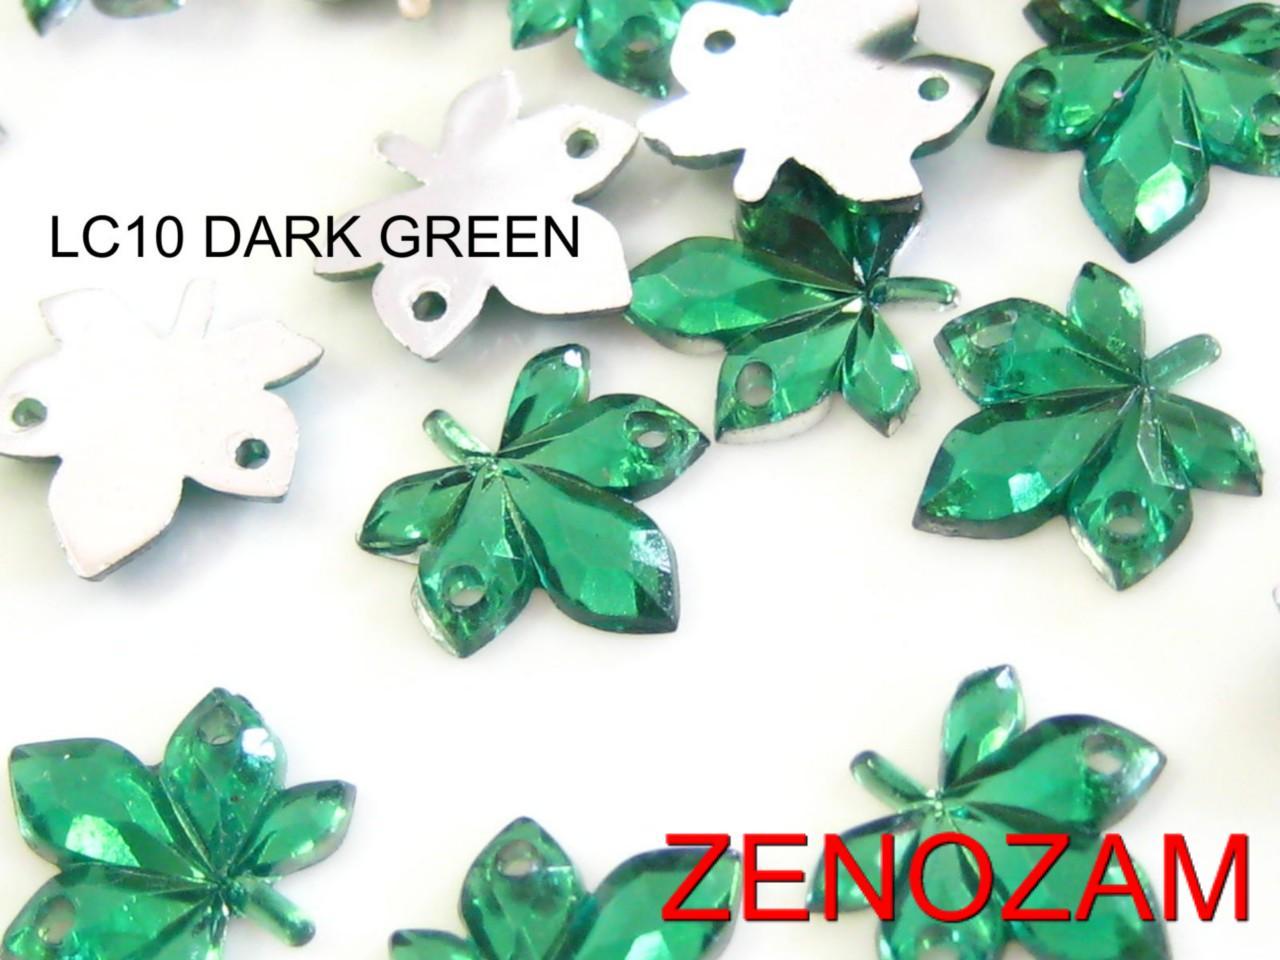 50-pcs-LEAVES-small-RHINESTONE-10x10mm-DK-GREEN-Acrylic-Jewel-Flatback-SEW-ON